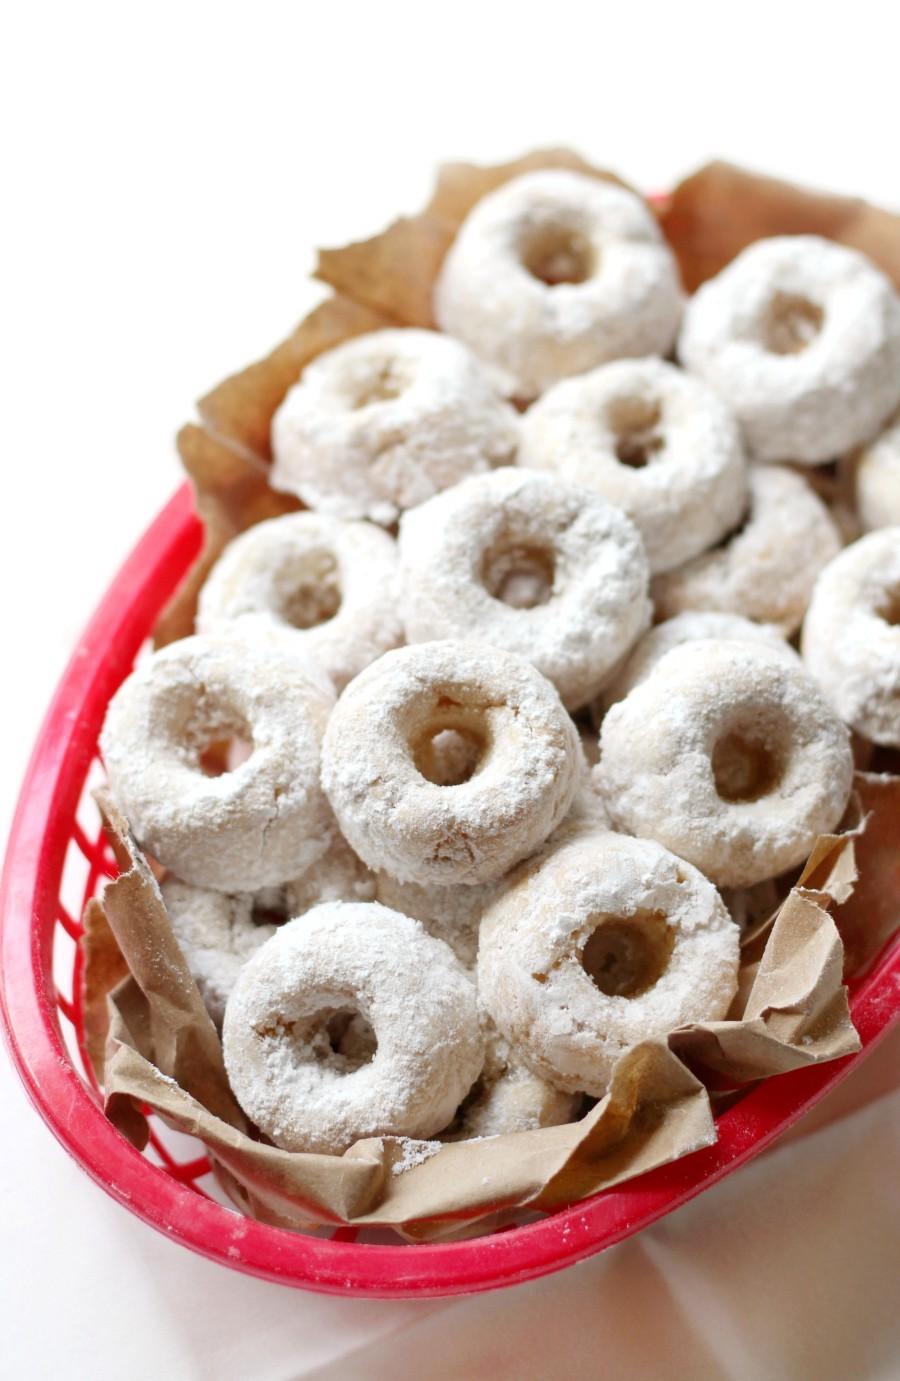 mini-powdered-donuts-red-basket